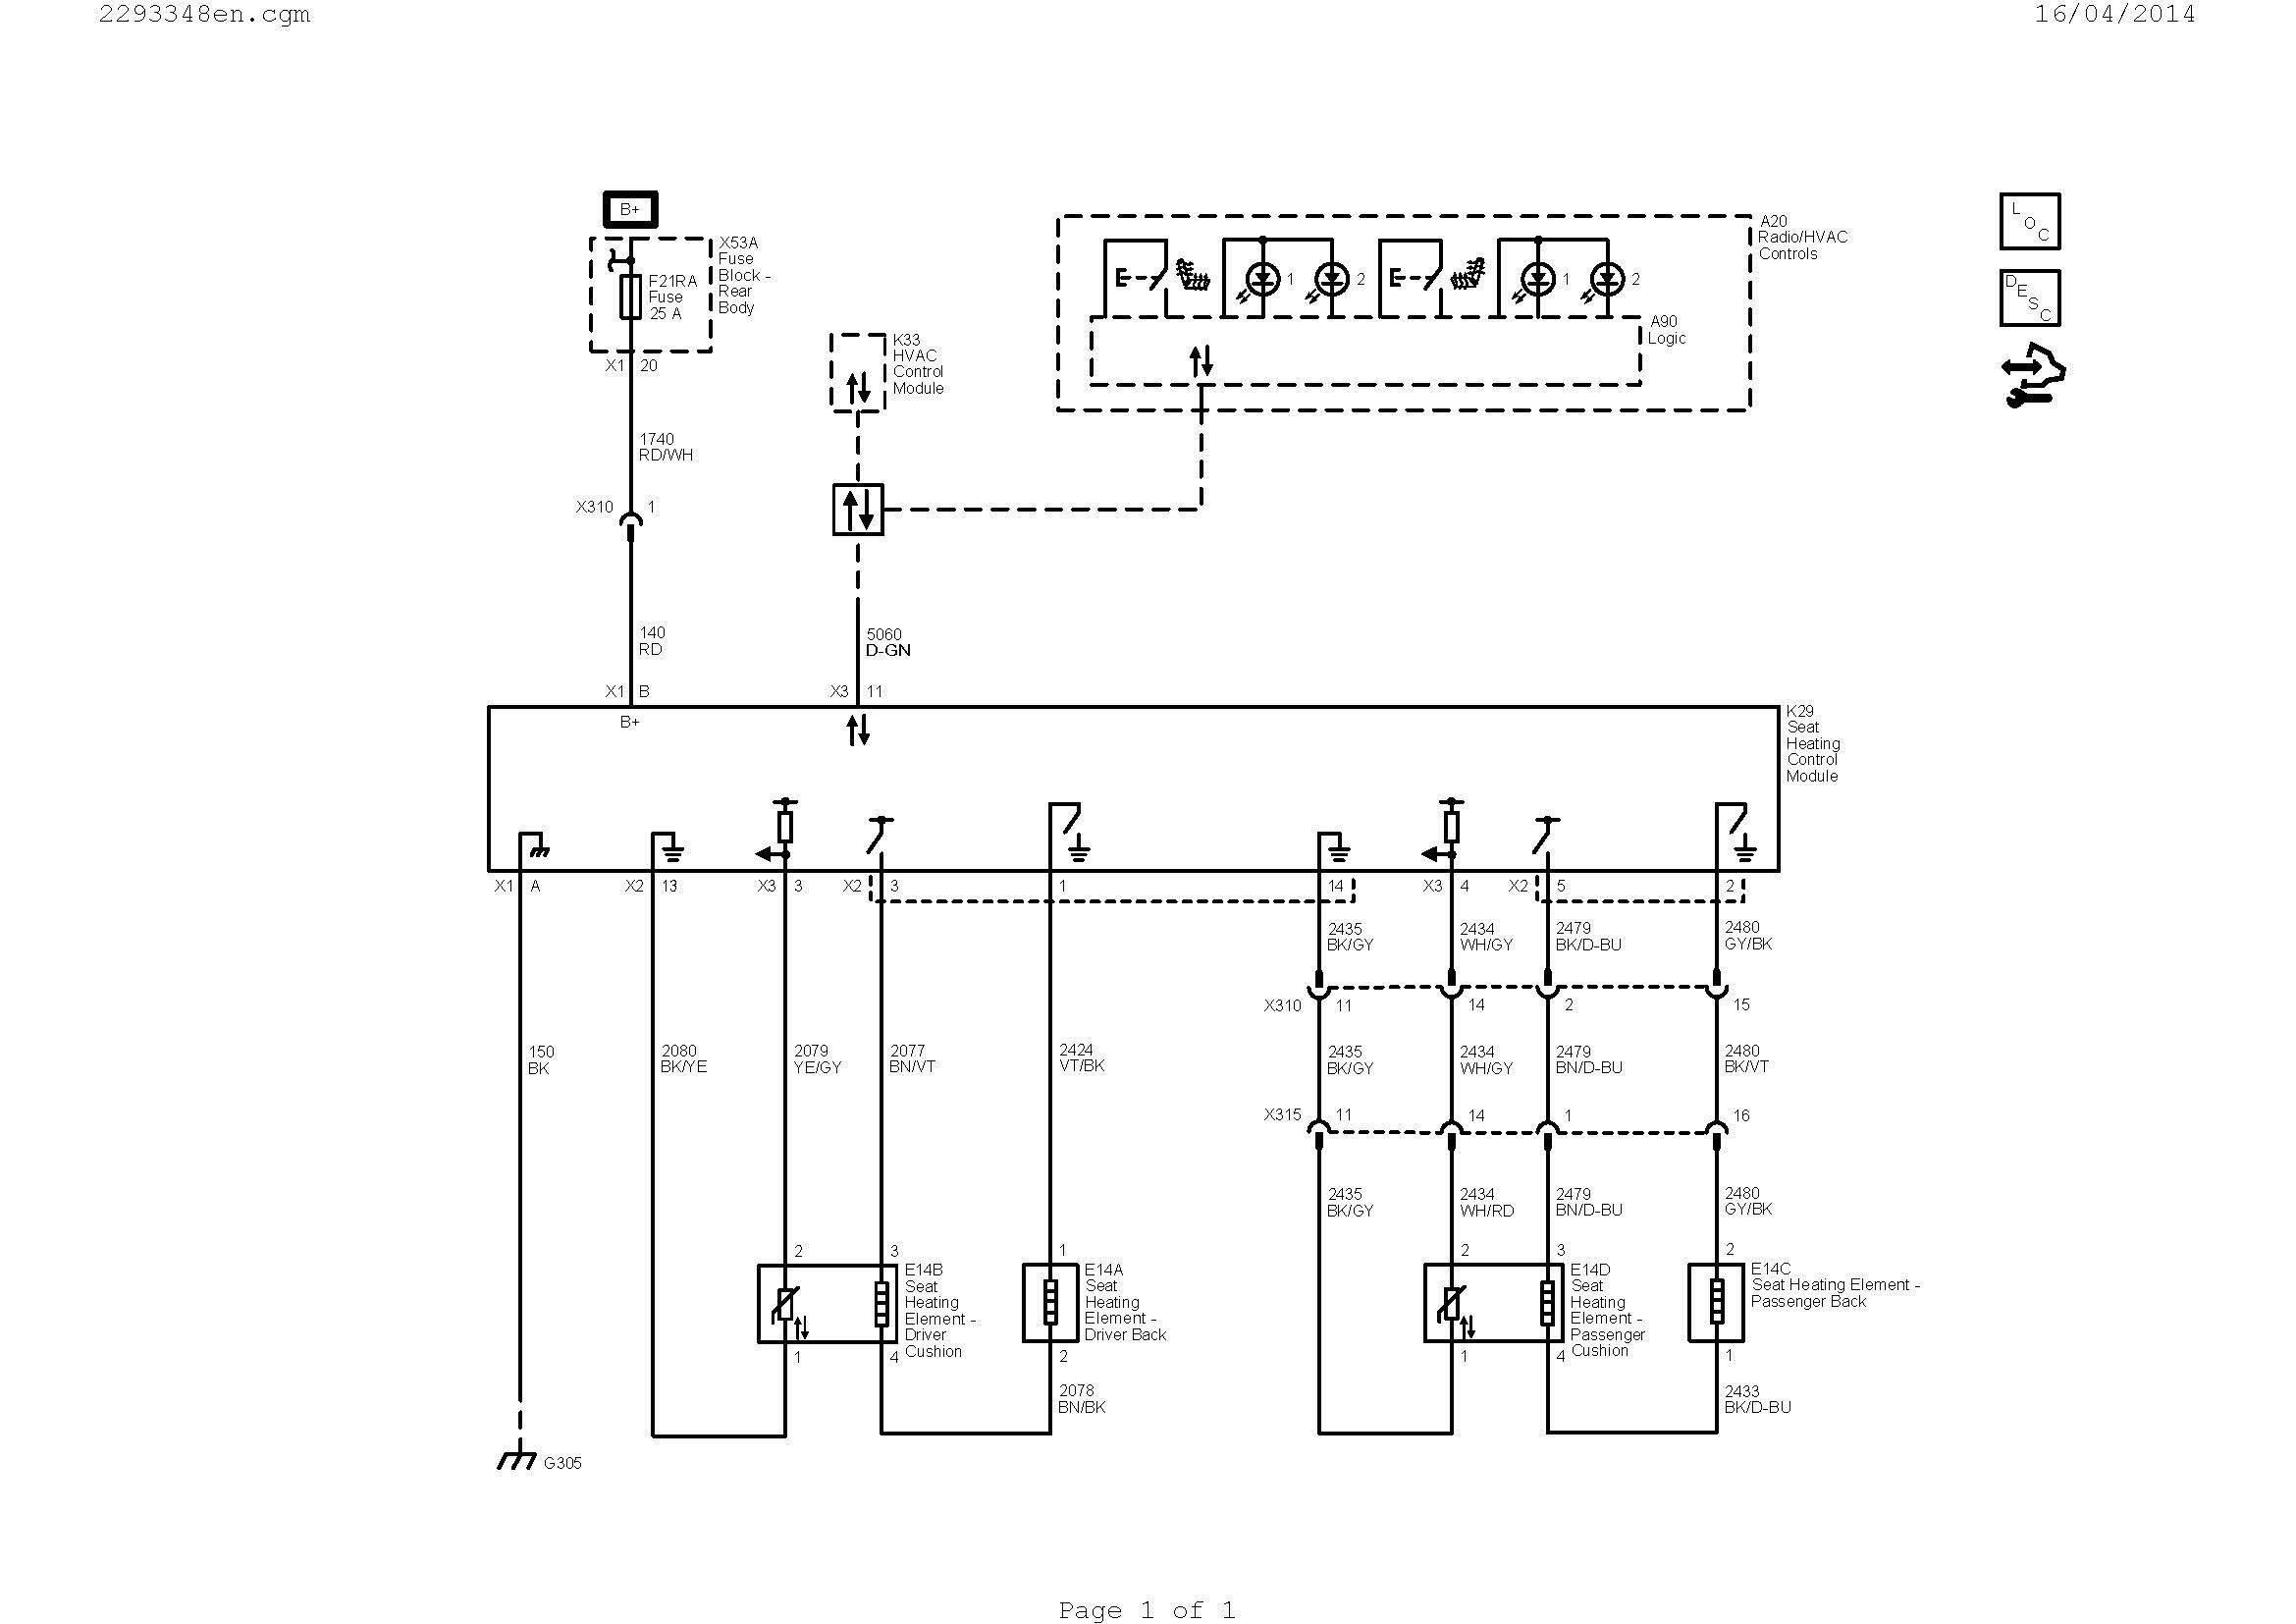 Blower Motor Wiring Diagram Manual In 2020 Electrical Wiring Diagram Electrical Diagram Diagram